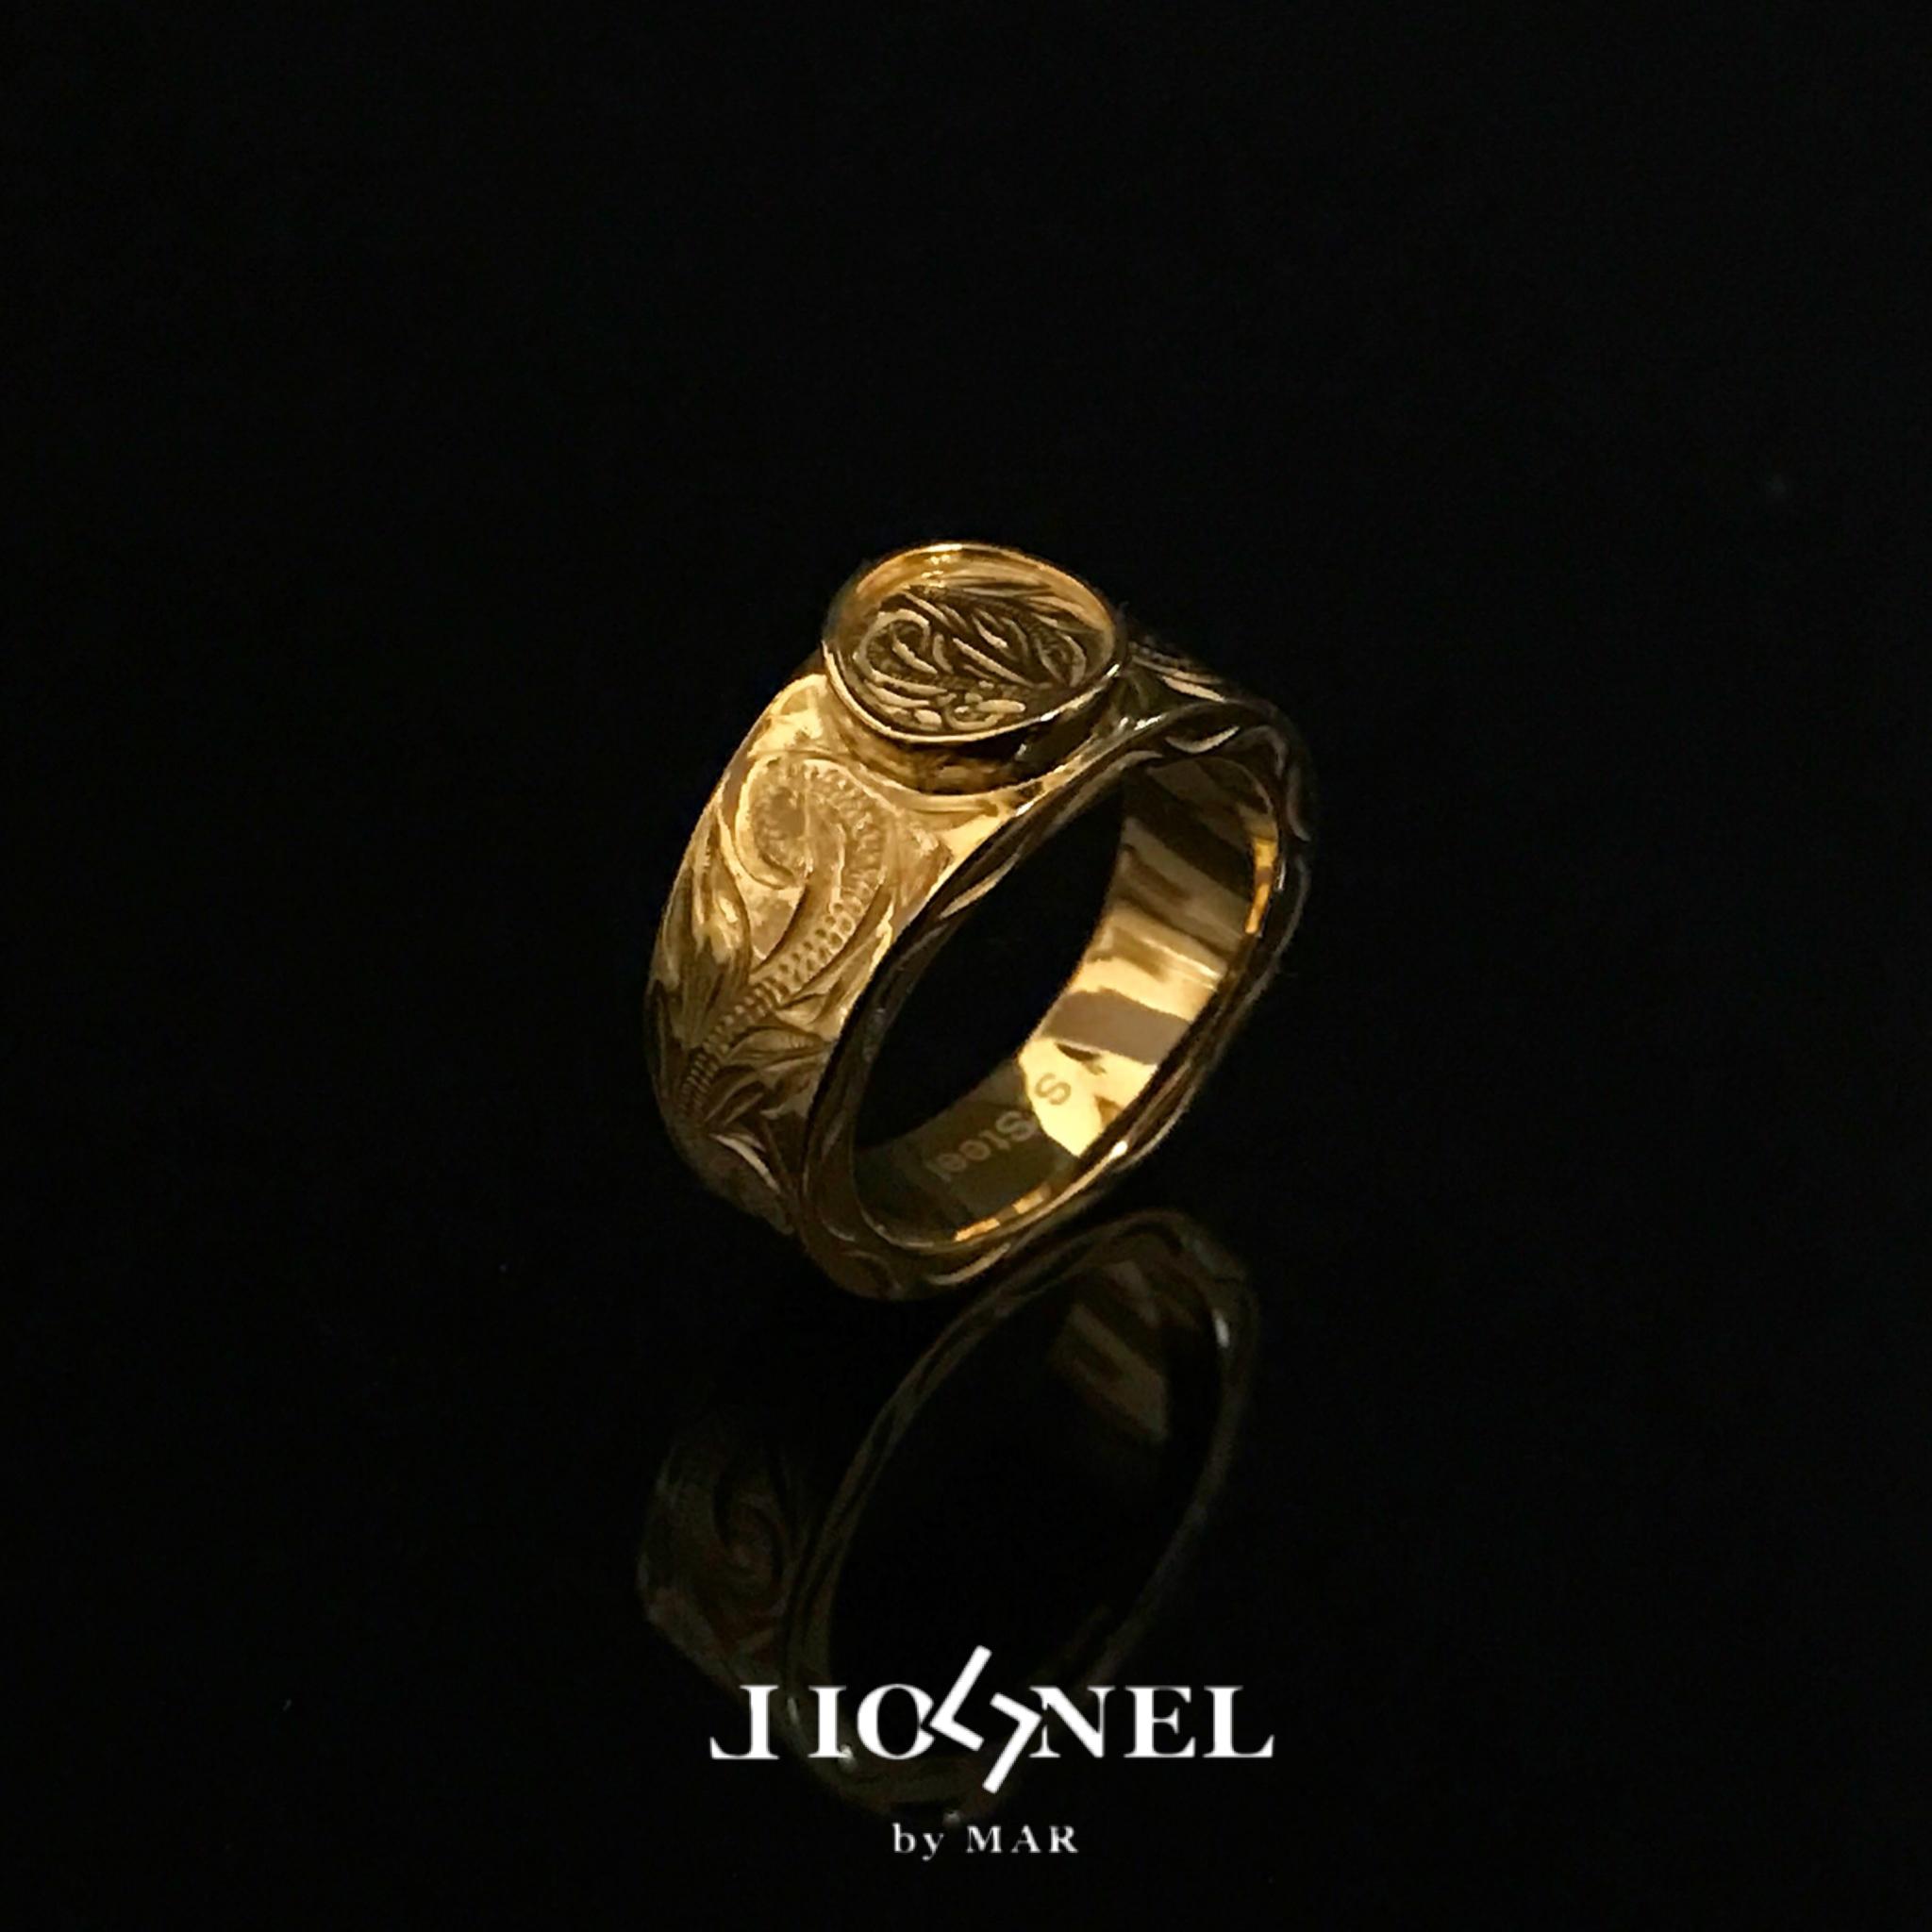 24kgp Hawaiian jewelry ring(coin)